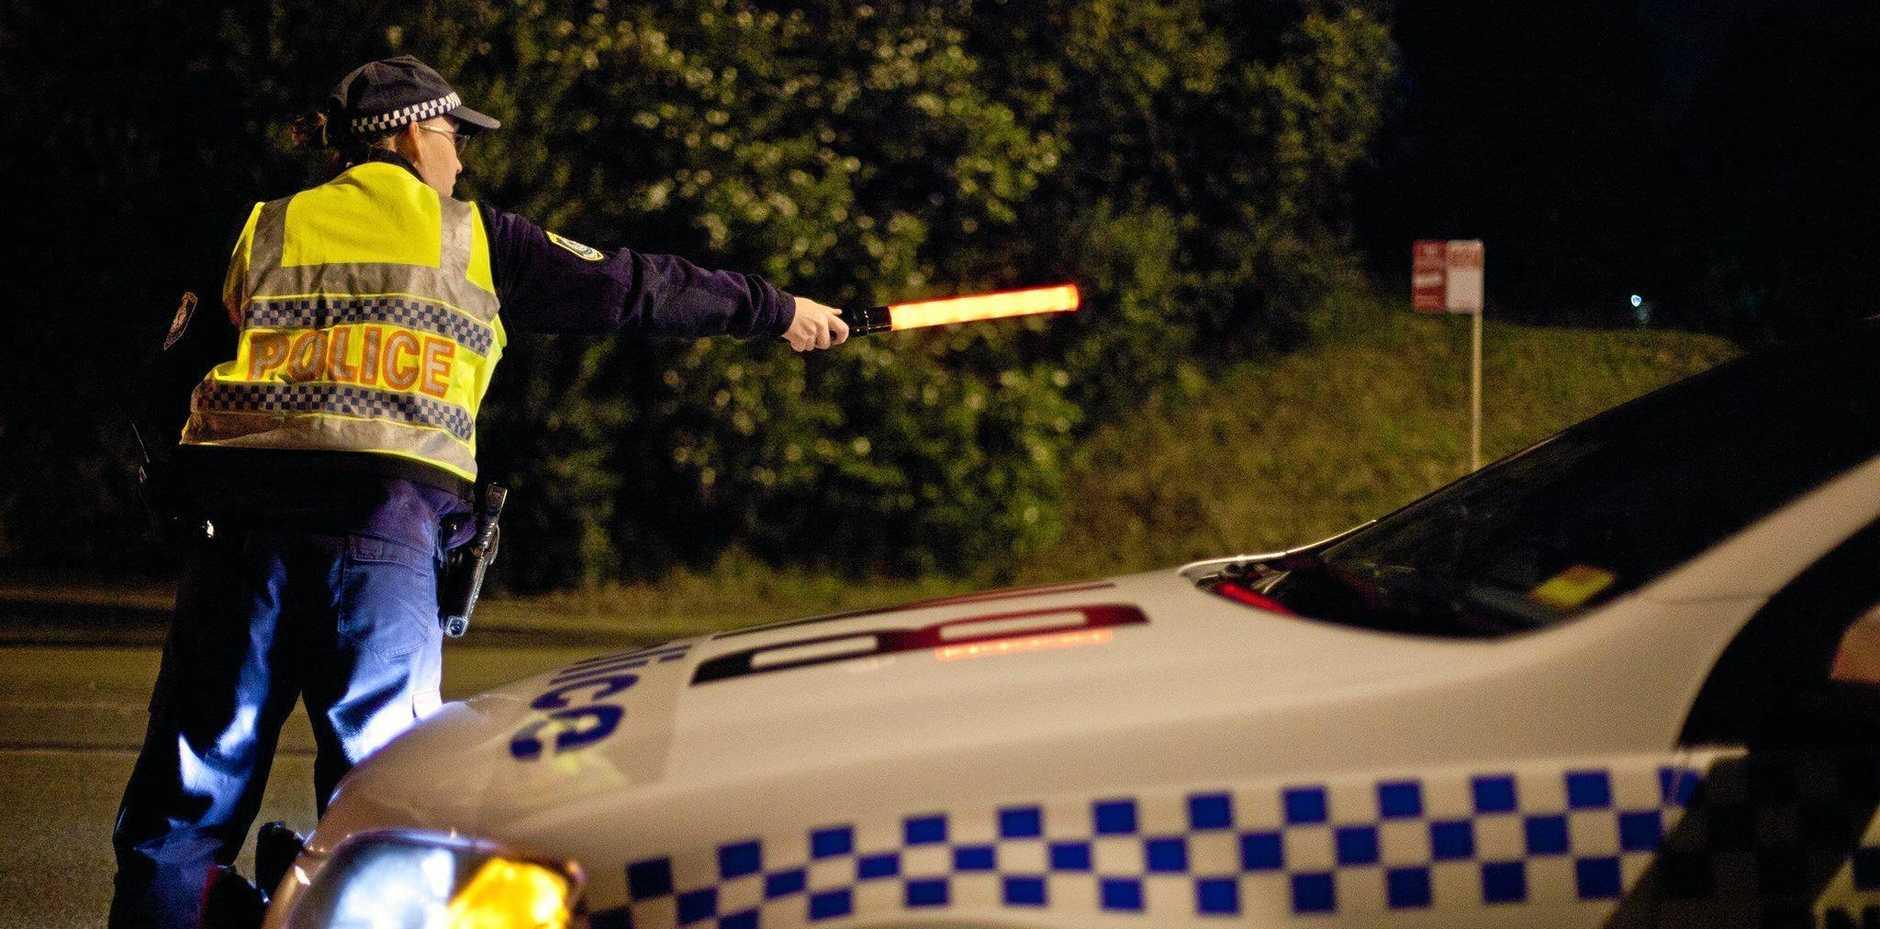 NSW Police Media Highway Patrol RBT generic